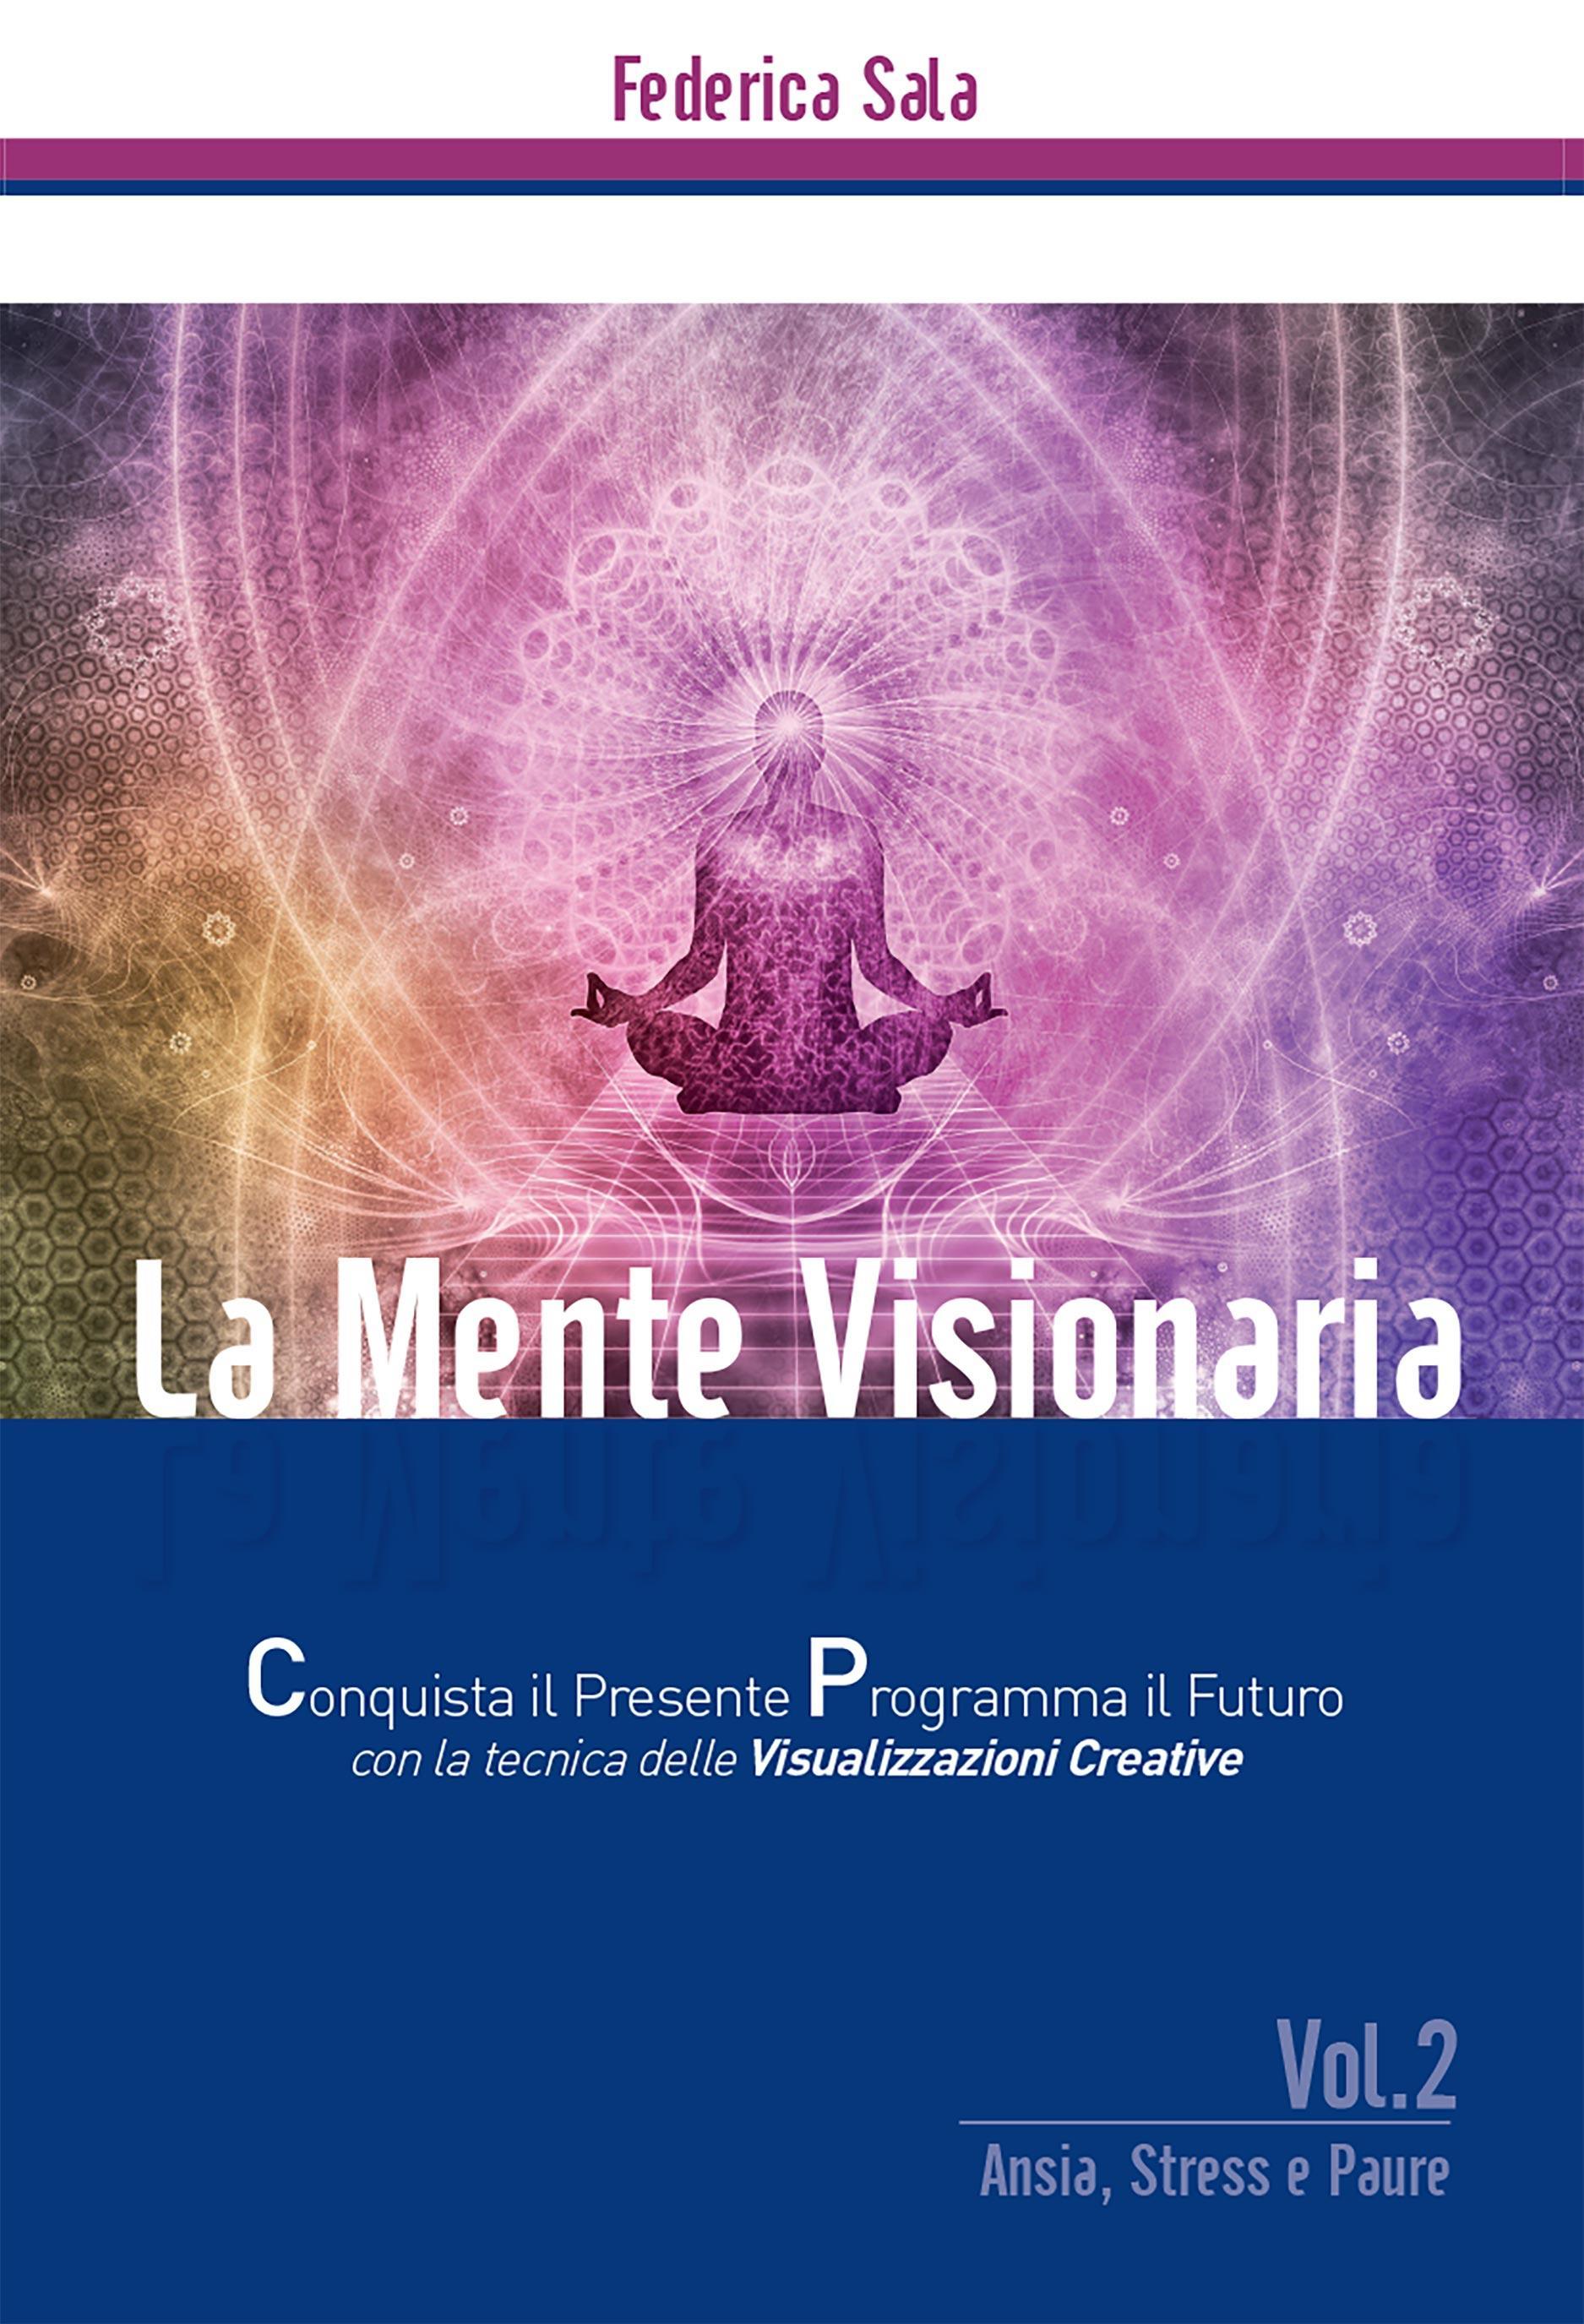 La Mente Visionaria Vol.2 Ansia, Stress & Paure